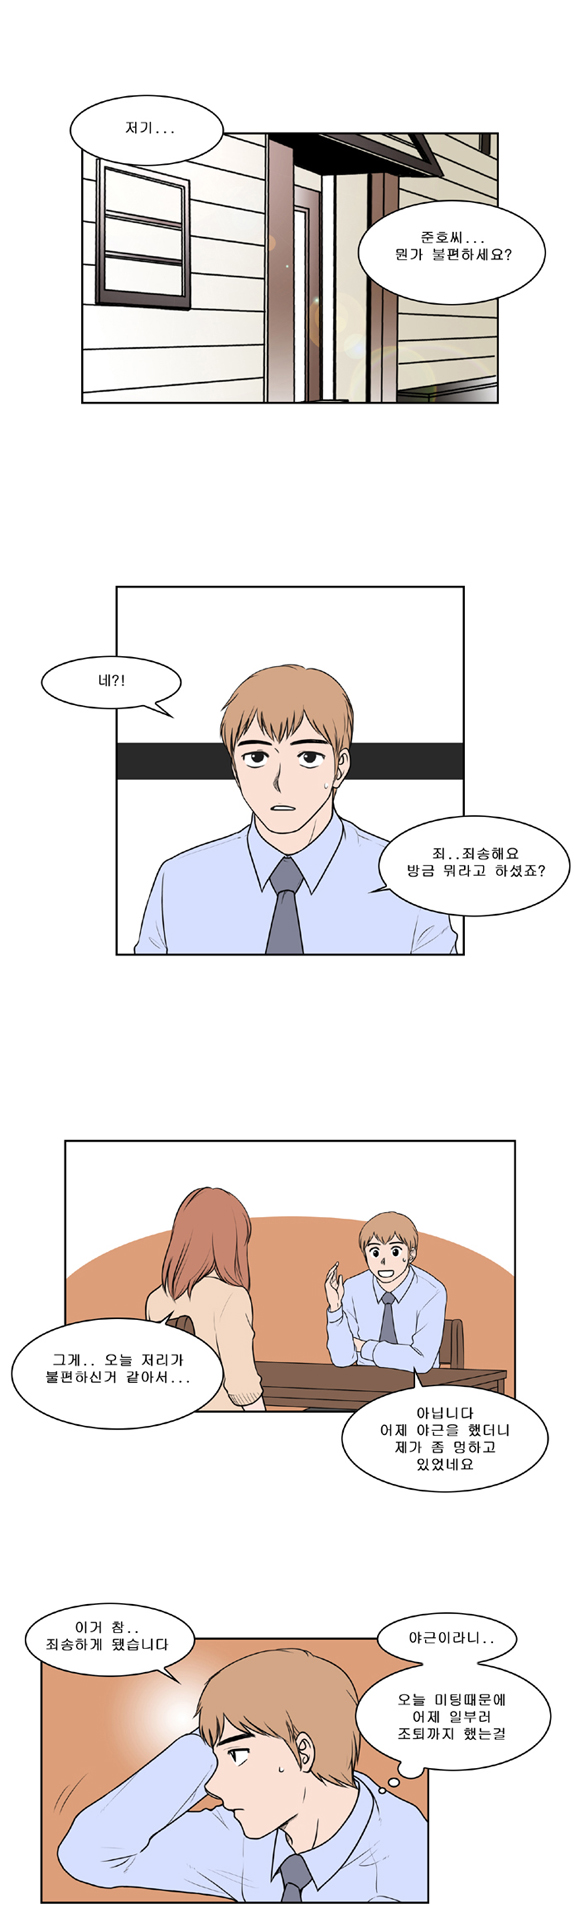 duocartoon_12_01.jpg